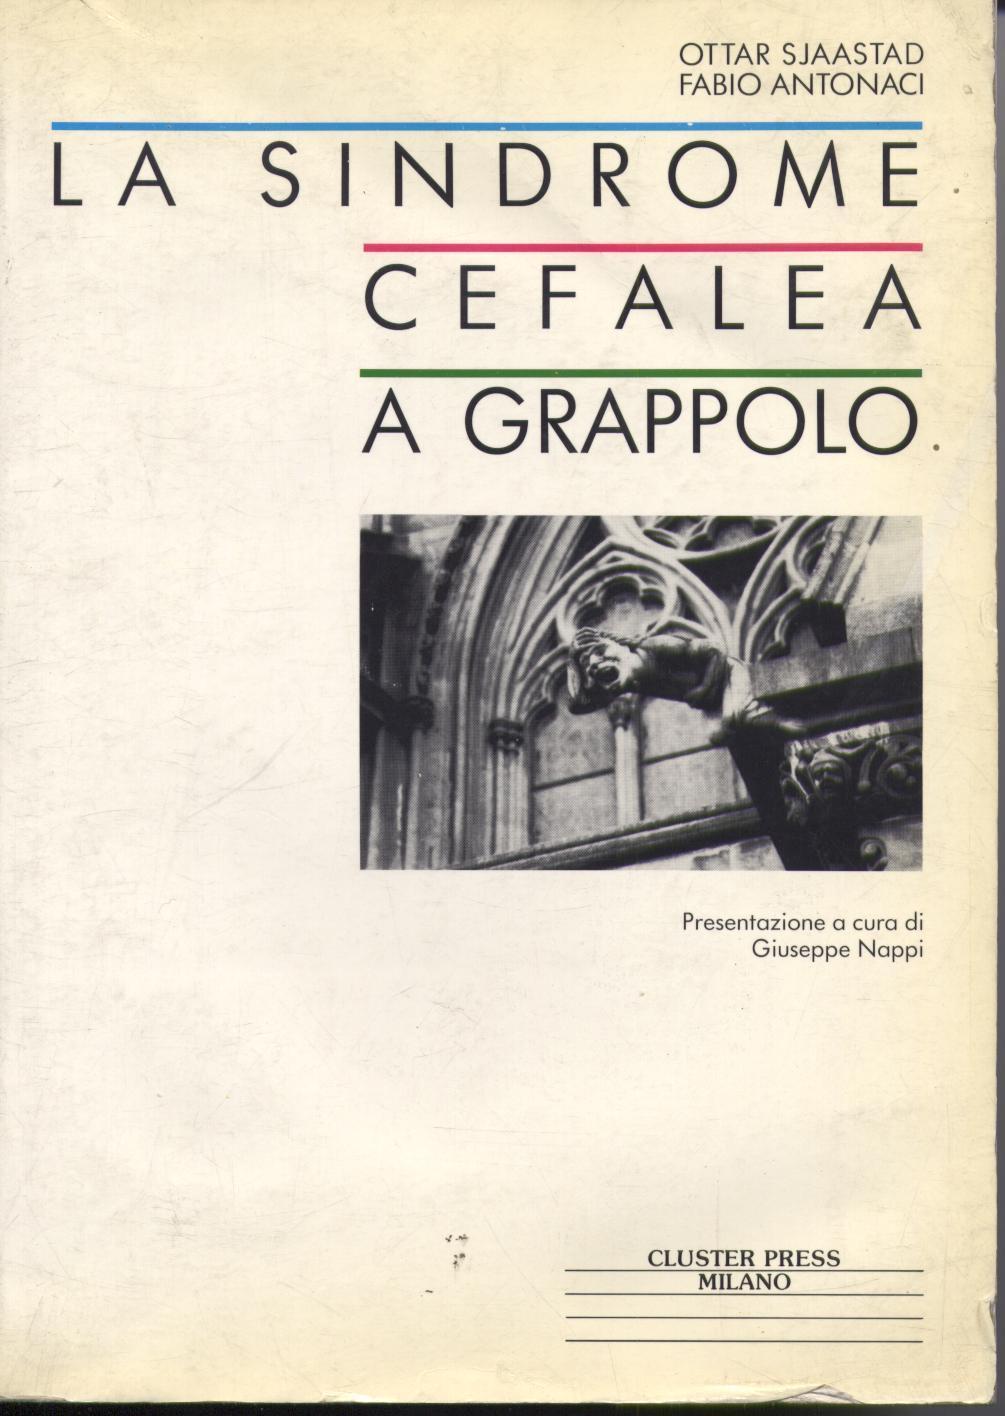 La Sindrome Cefalea a Grappolo Ottar Sjaastad Fabio Antonaci